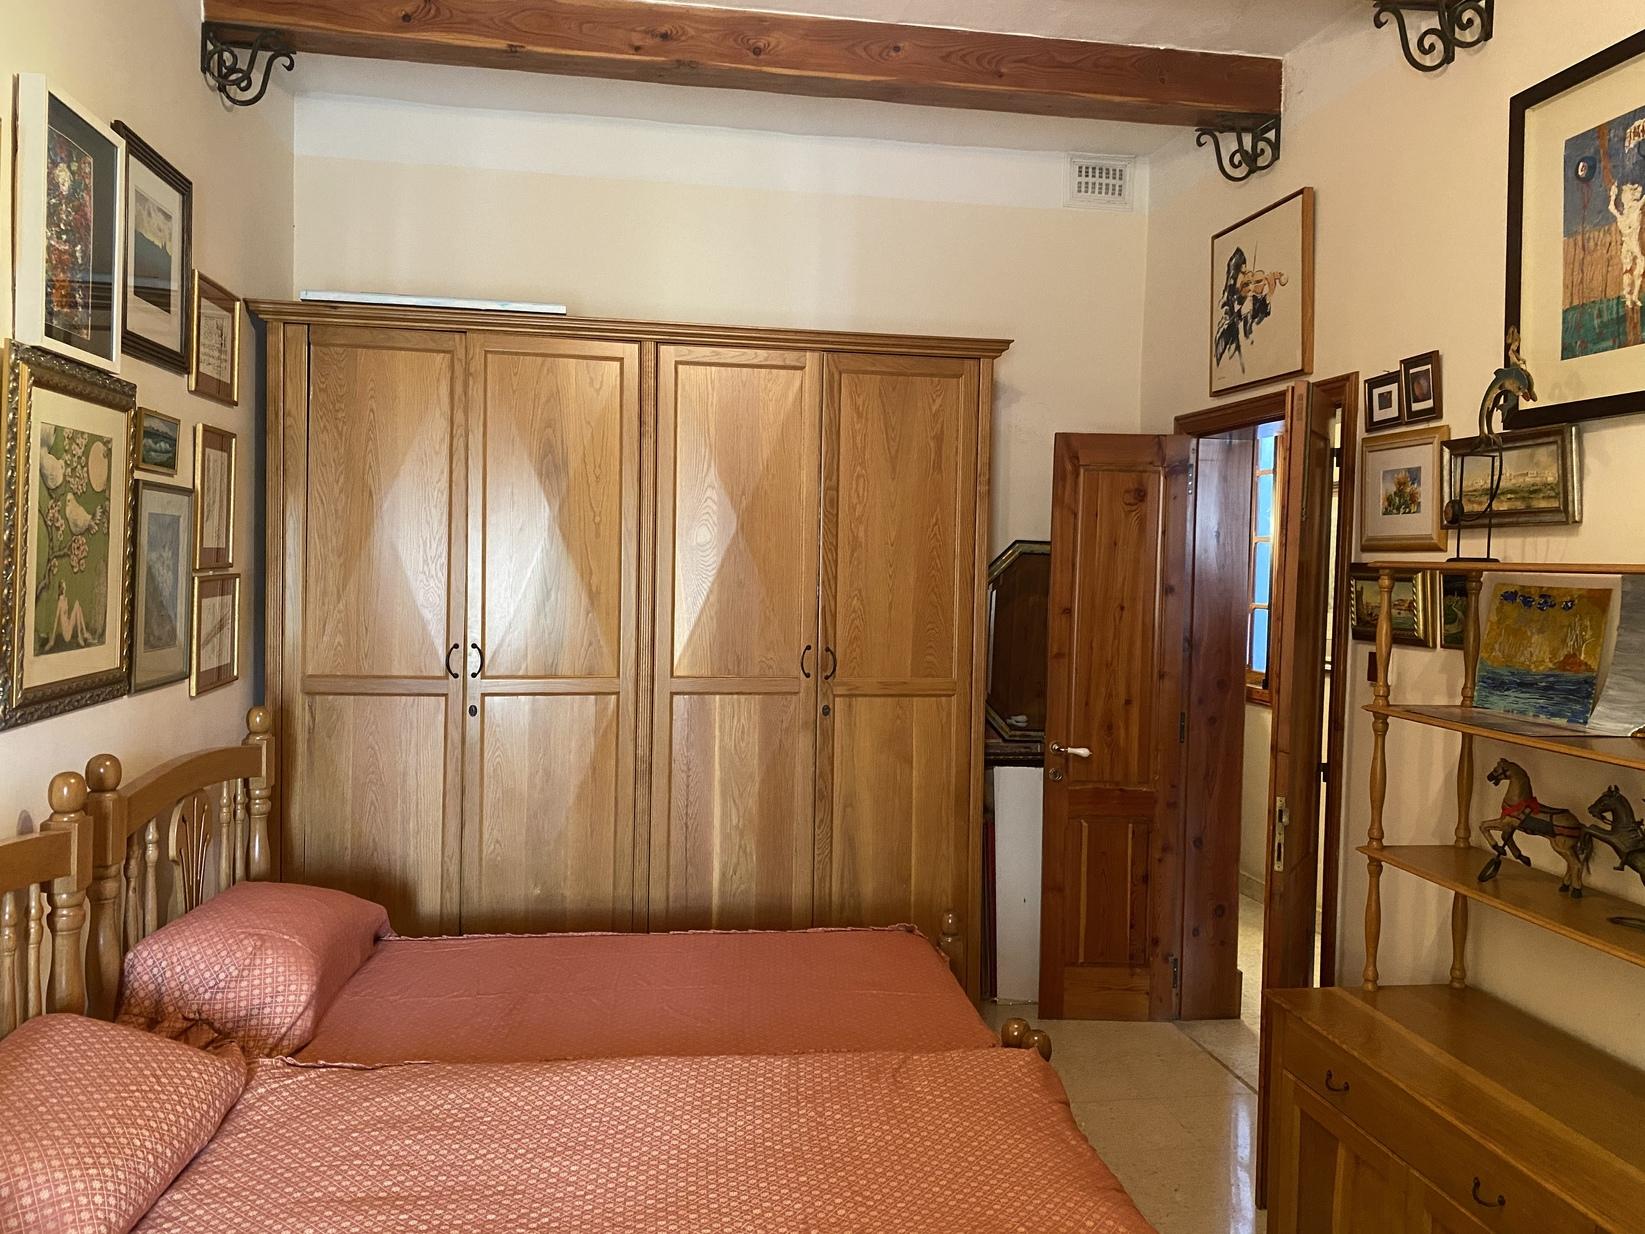 3 bed Terraced House For Sale in Santa Venera, Santa Venera - thumb 11